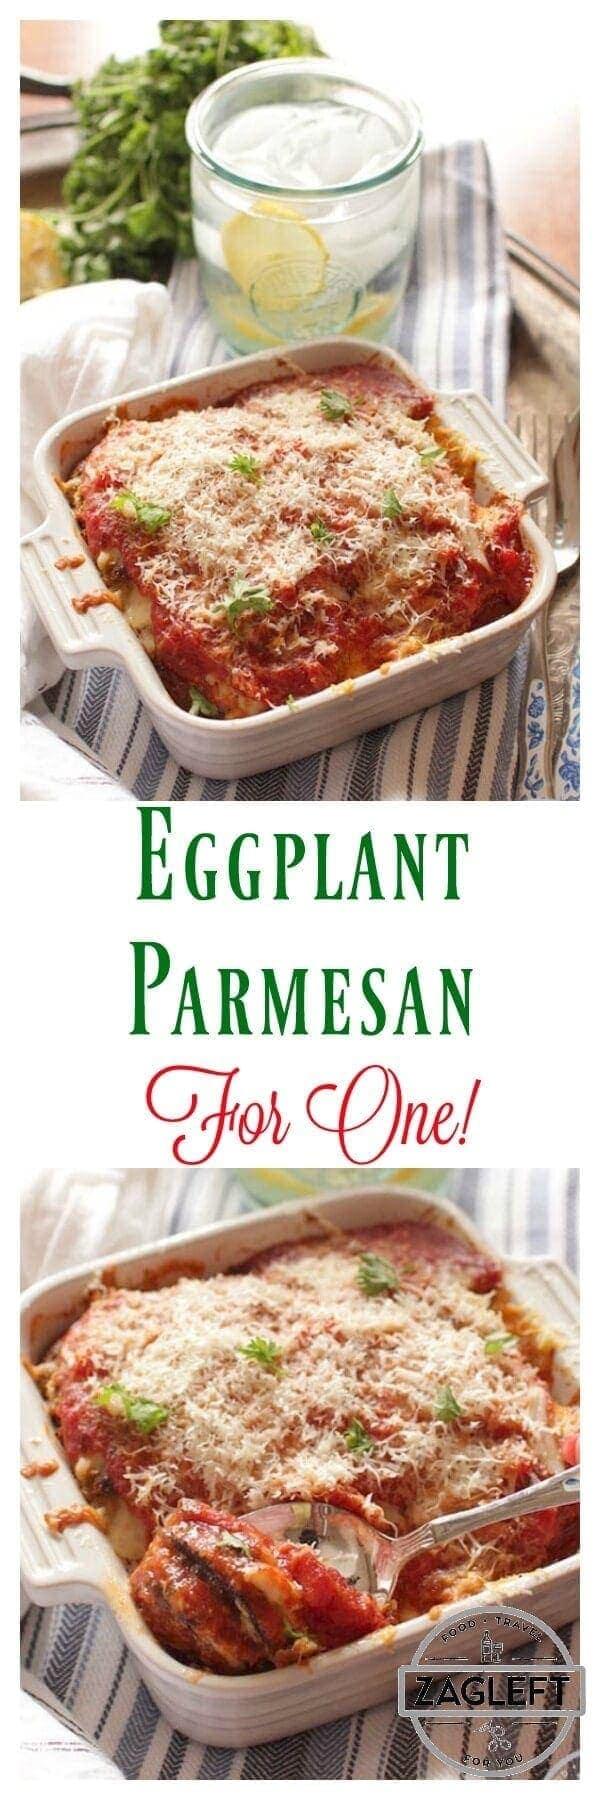 Eggplant Parmesan For One | onedishkitchen.com